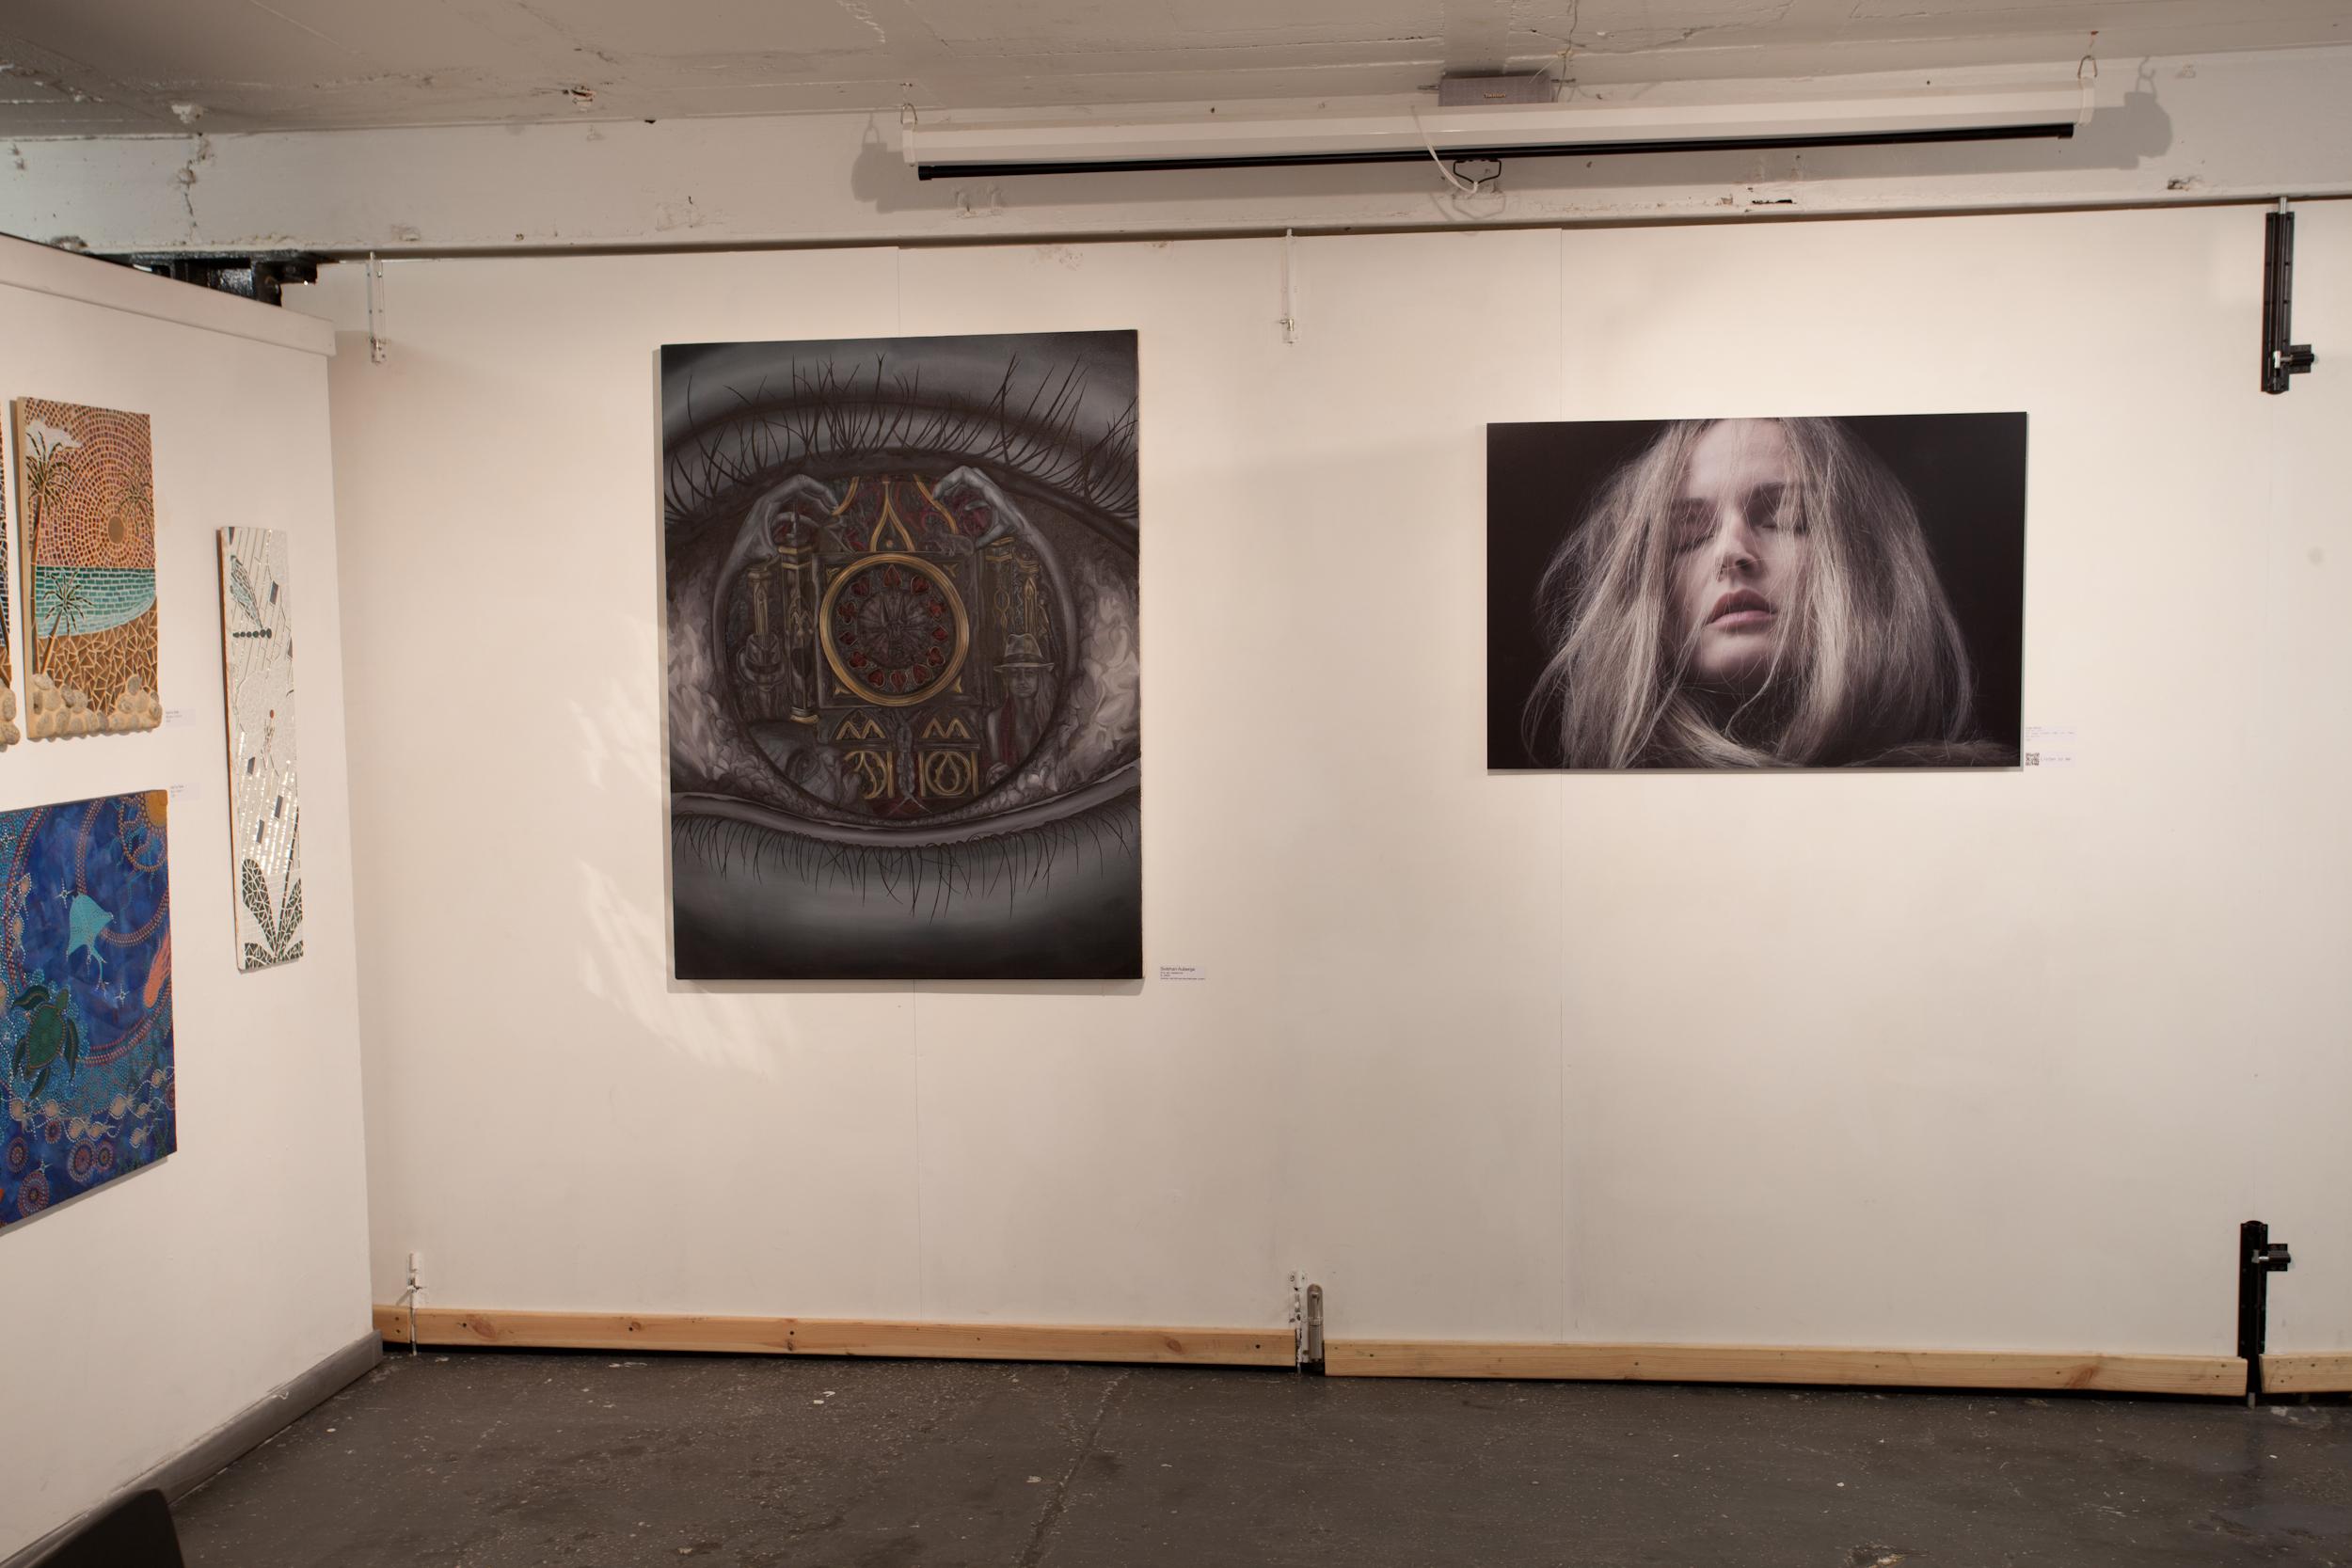 Affordable Art Fair at Vibe Gallery